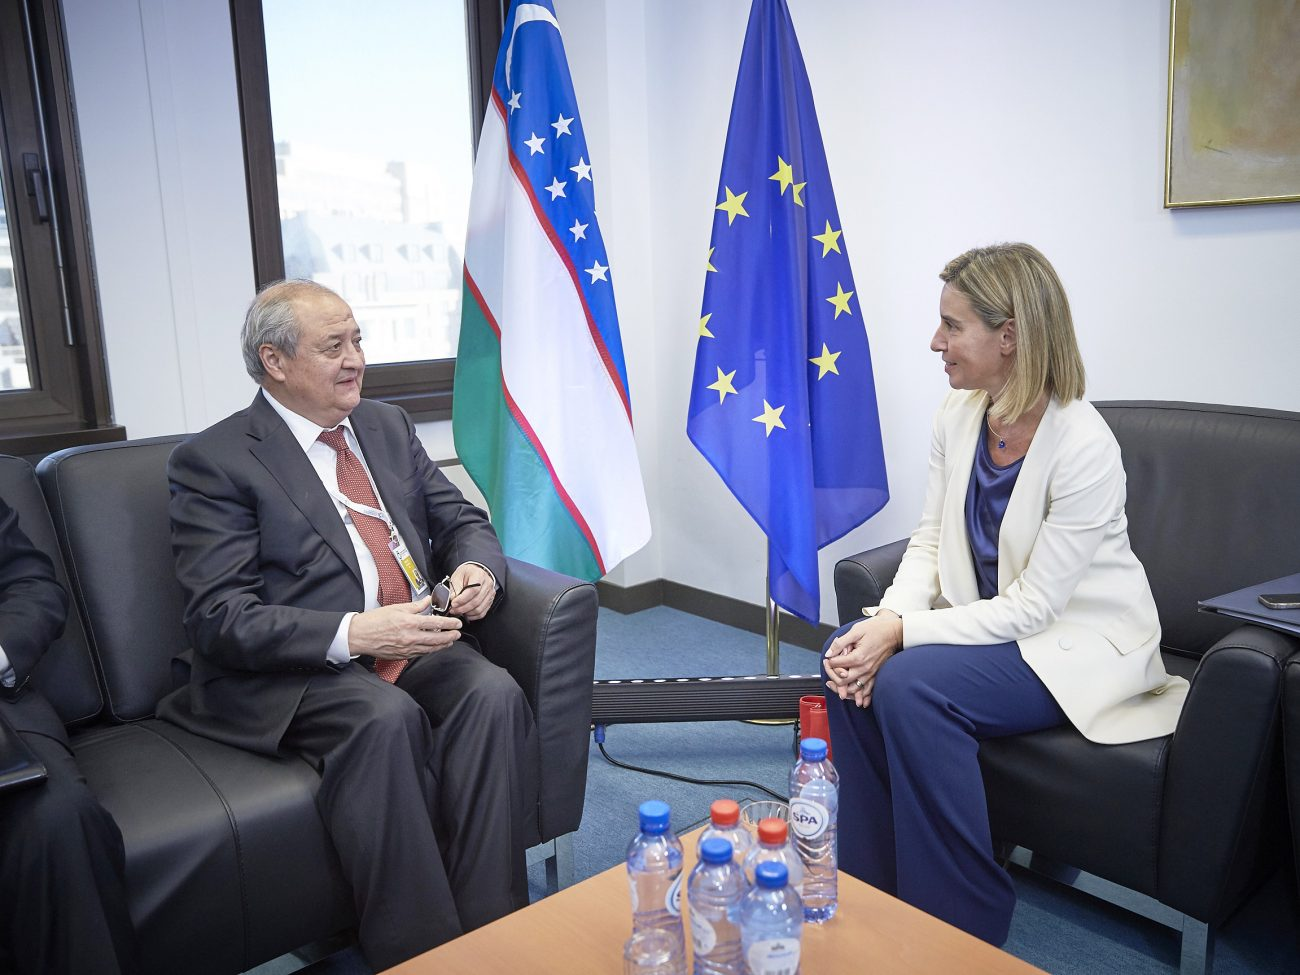 Federica Mogherini Abdulaziz Kamilov Union européenne Ouzbékistan Asie centrale